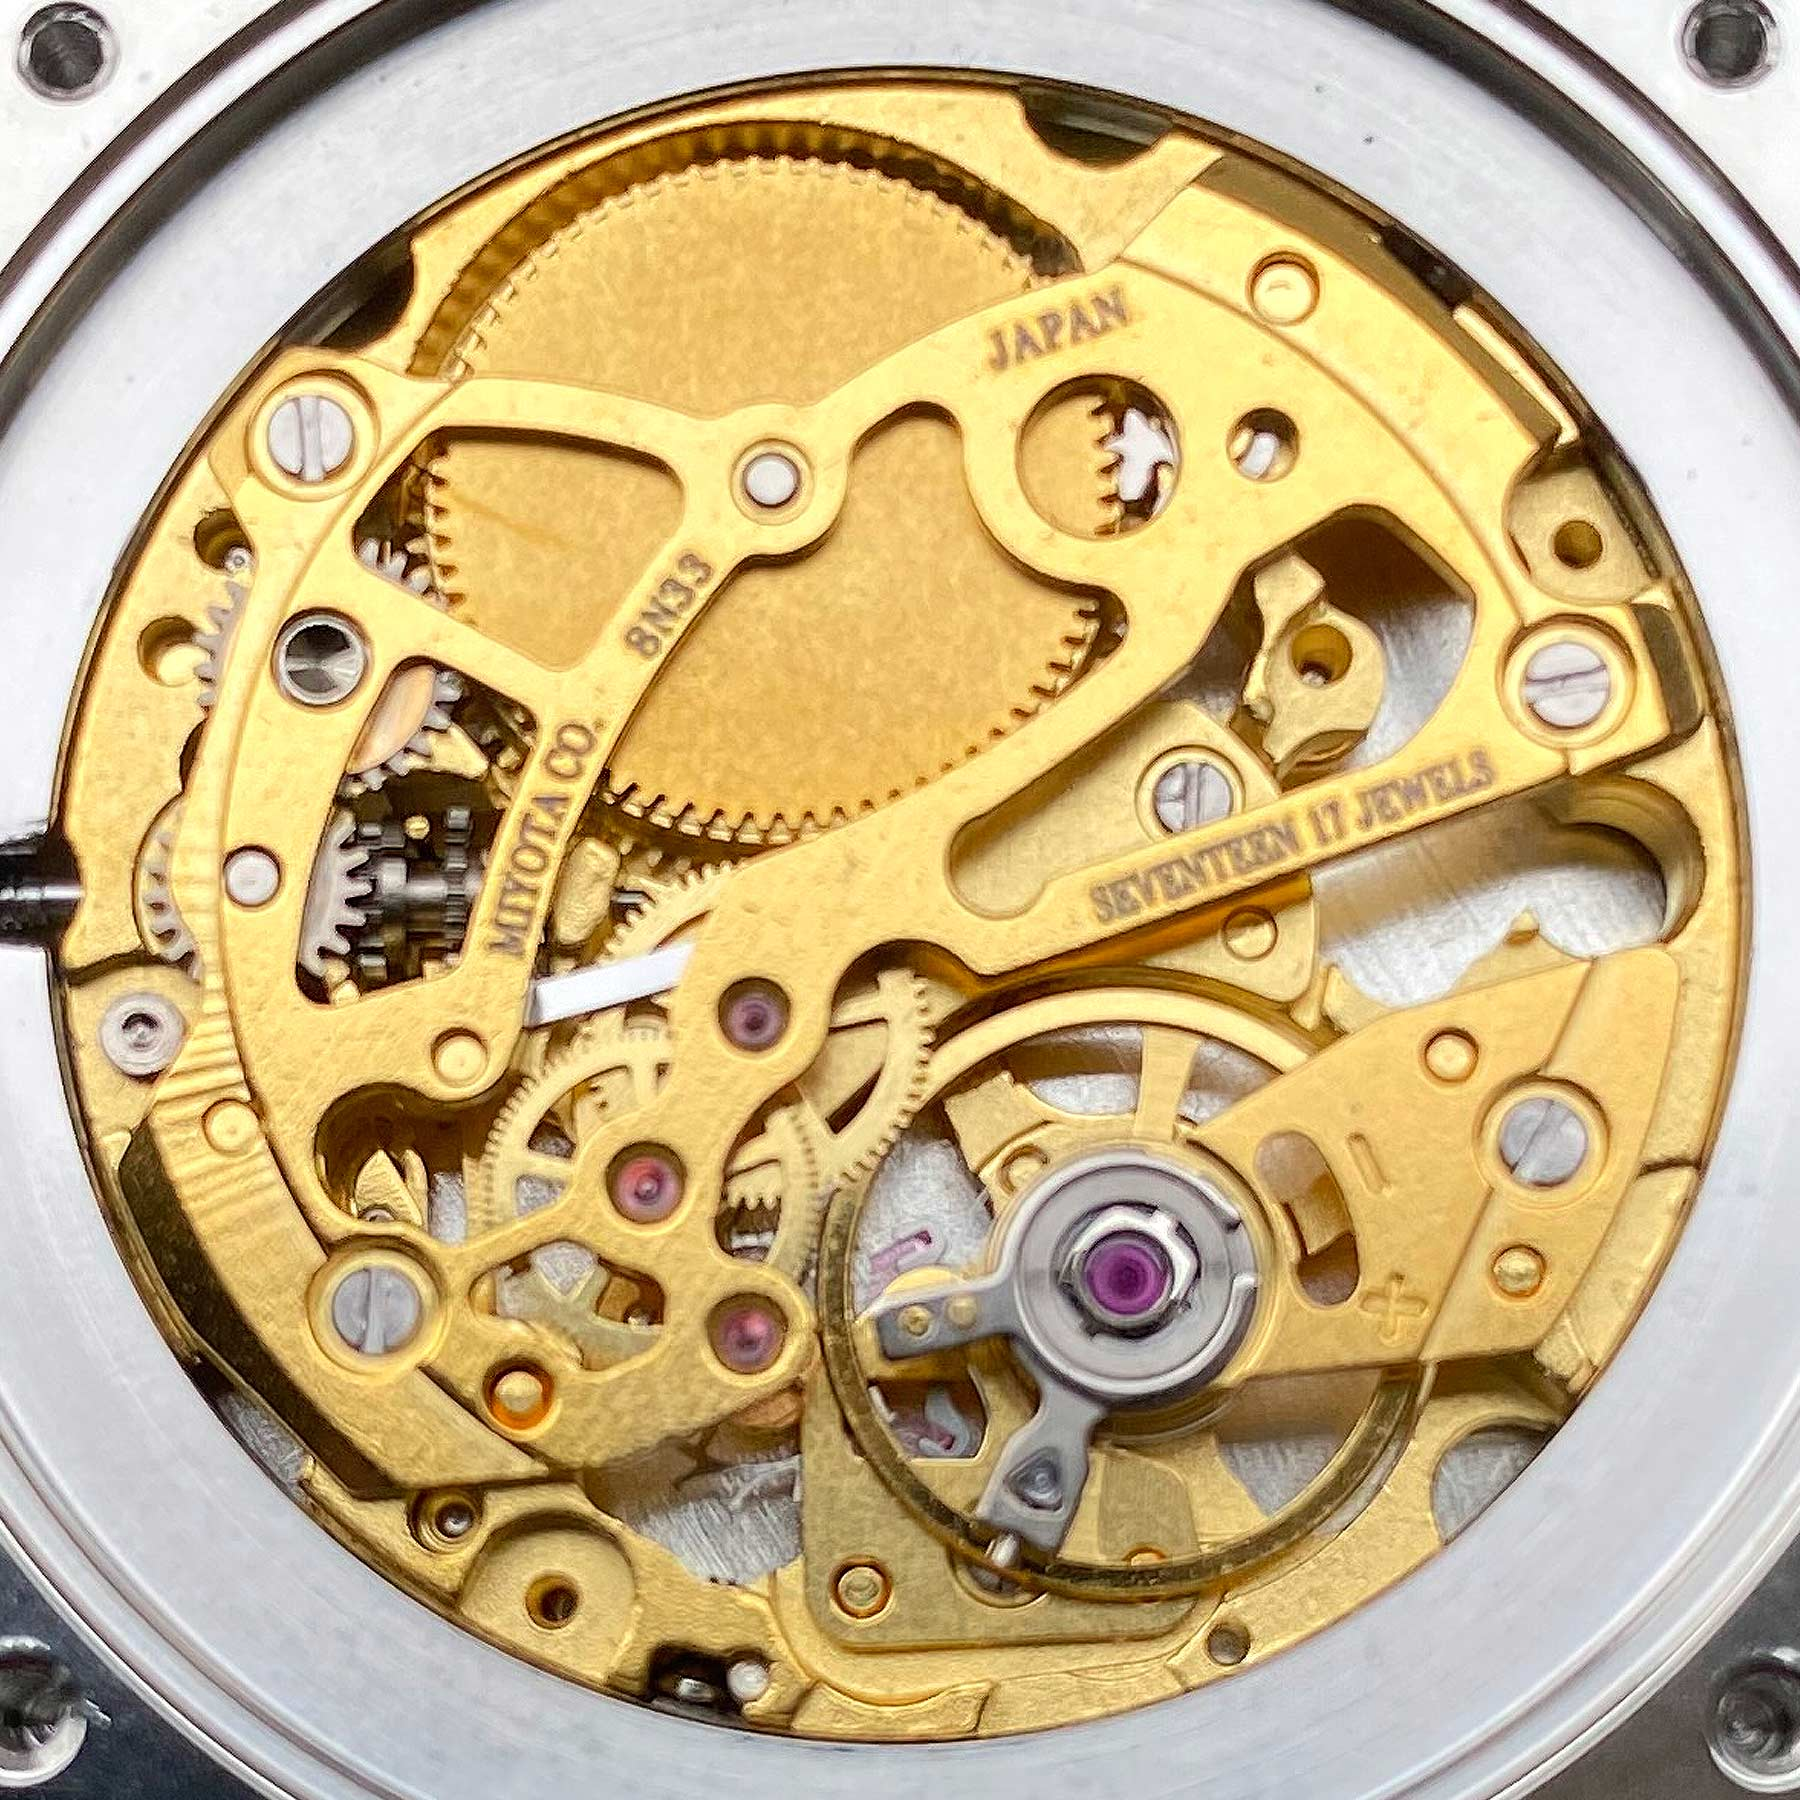 Miyota 8n33 Gold Cannonwatch